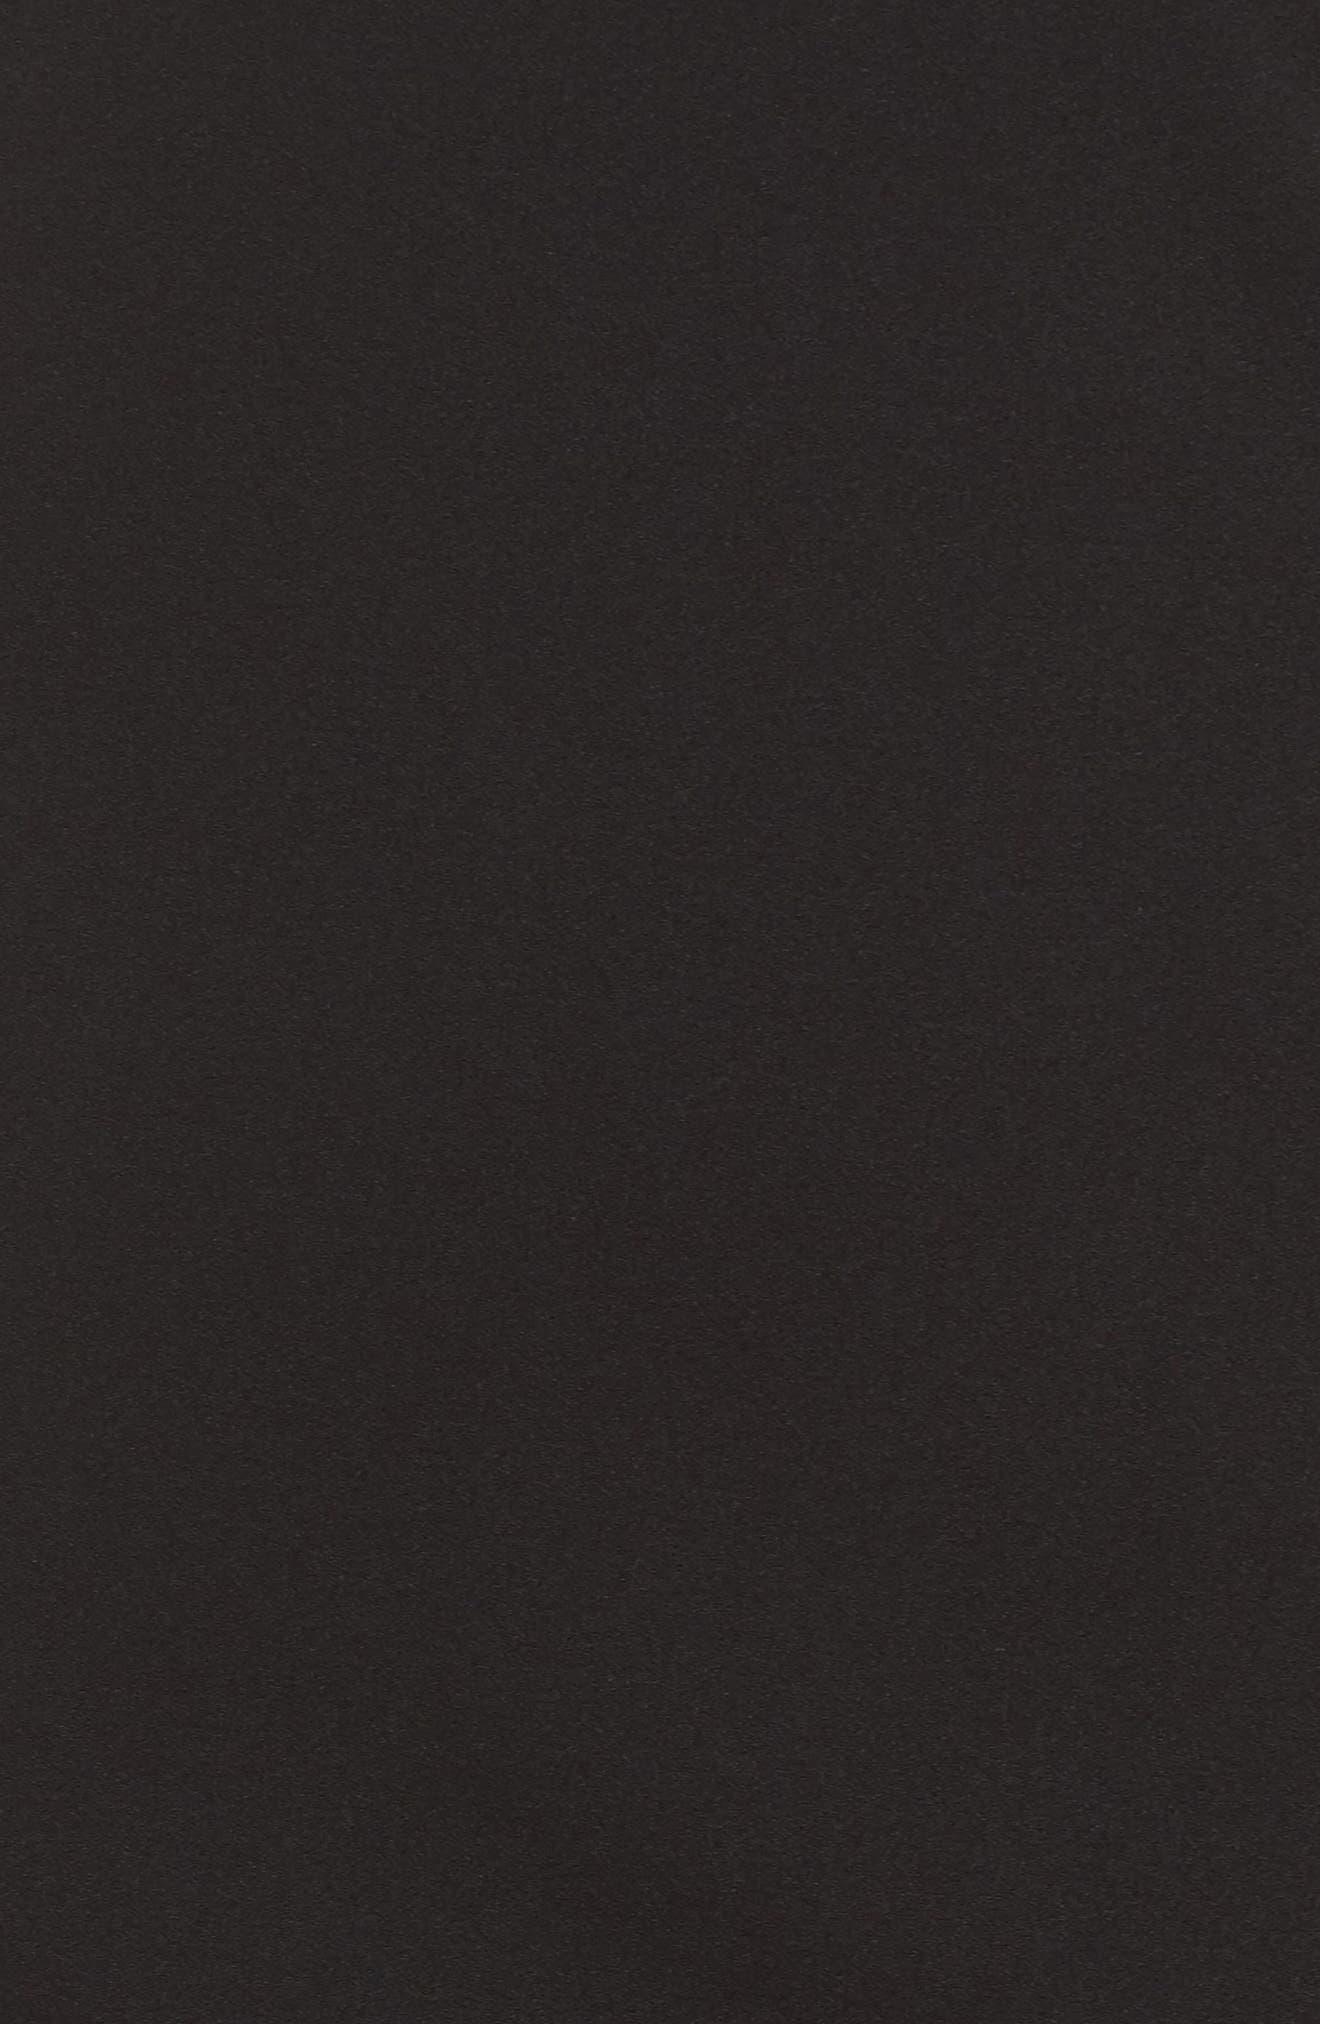 One-Shoulder Ruffle Dress,                             Alternate thumbnail 5, color,                             Black